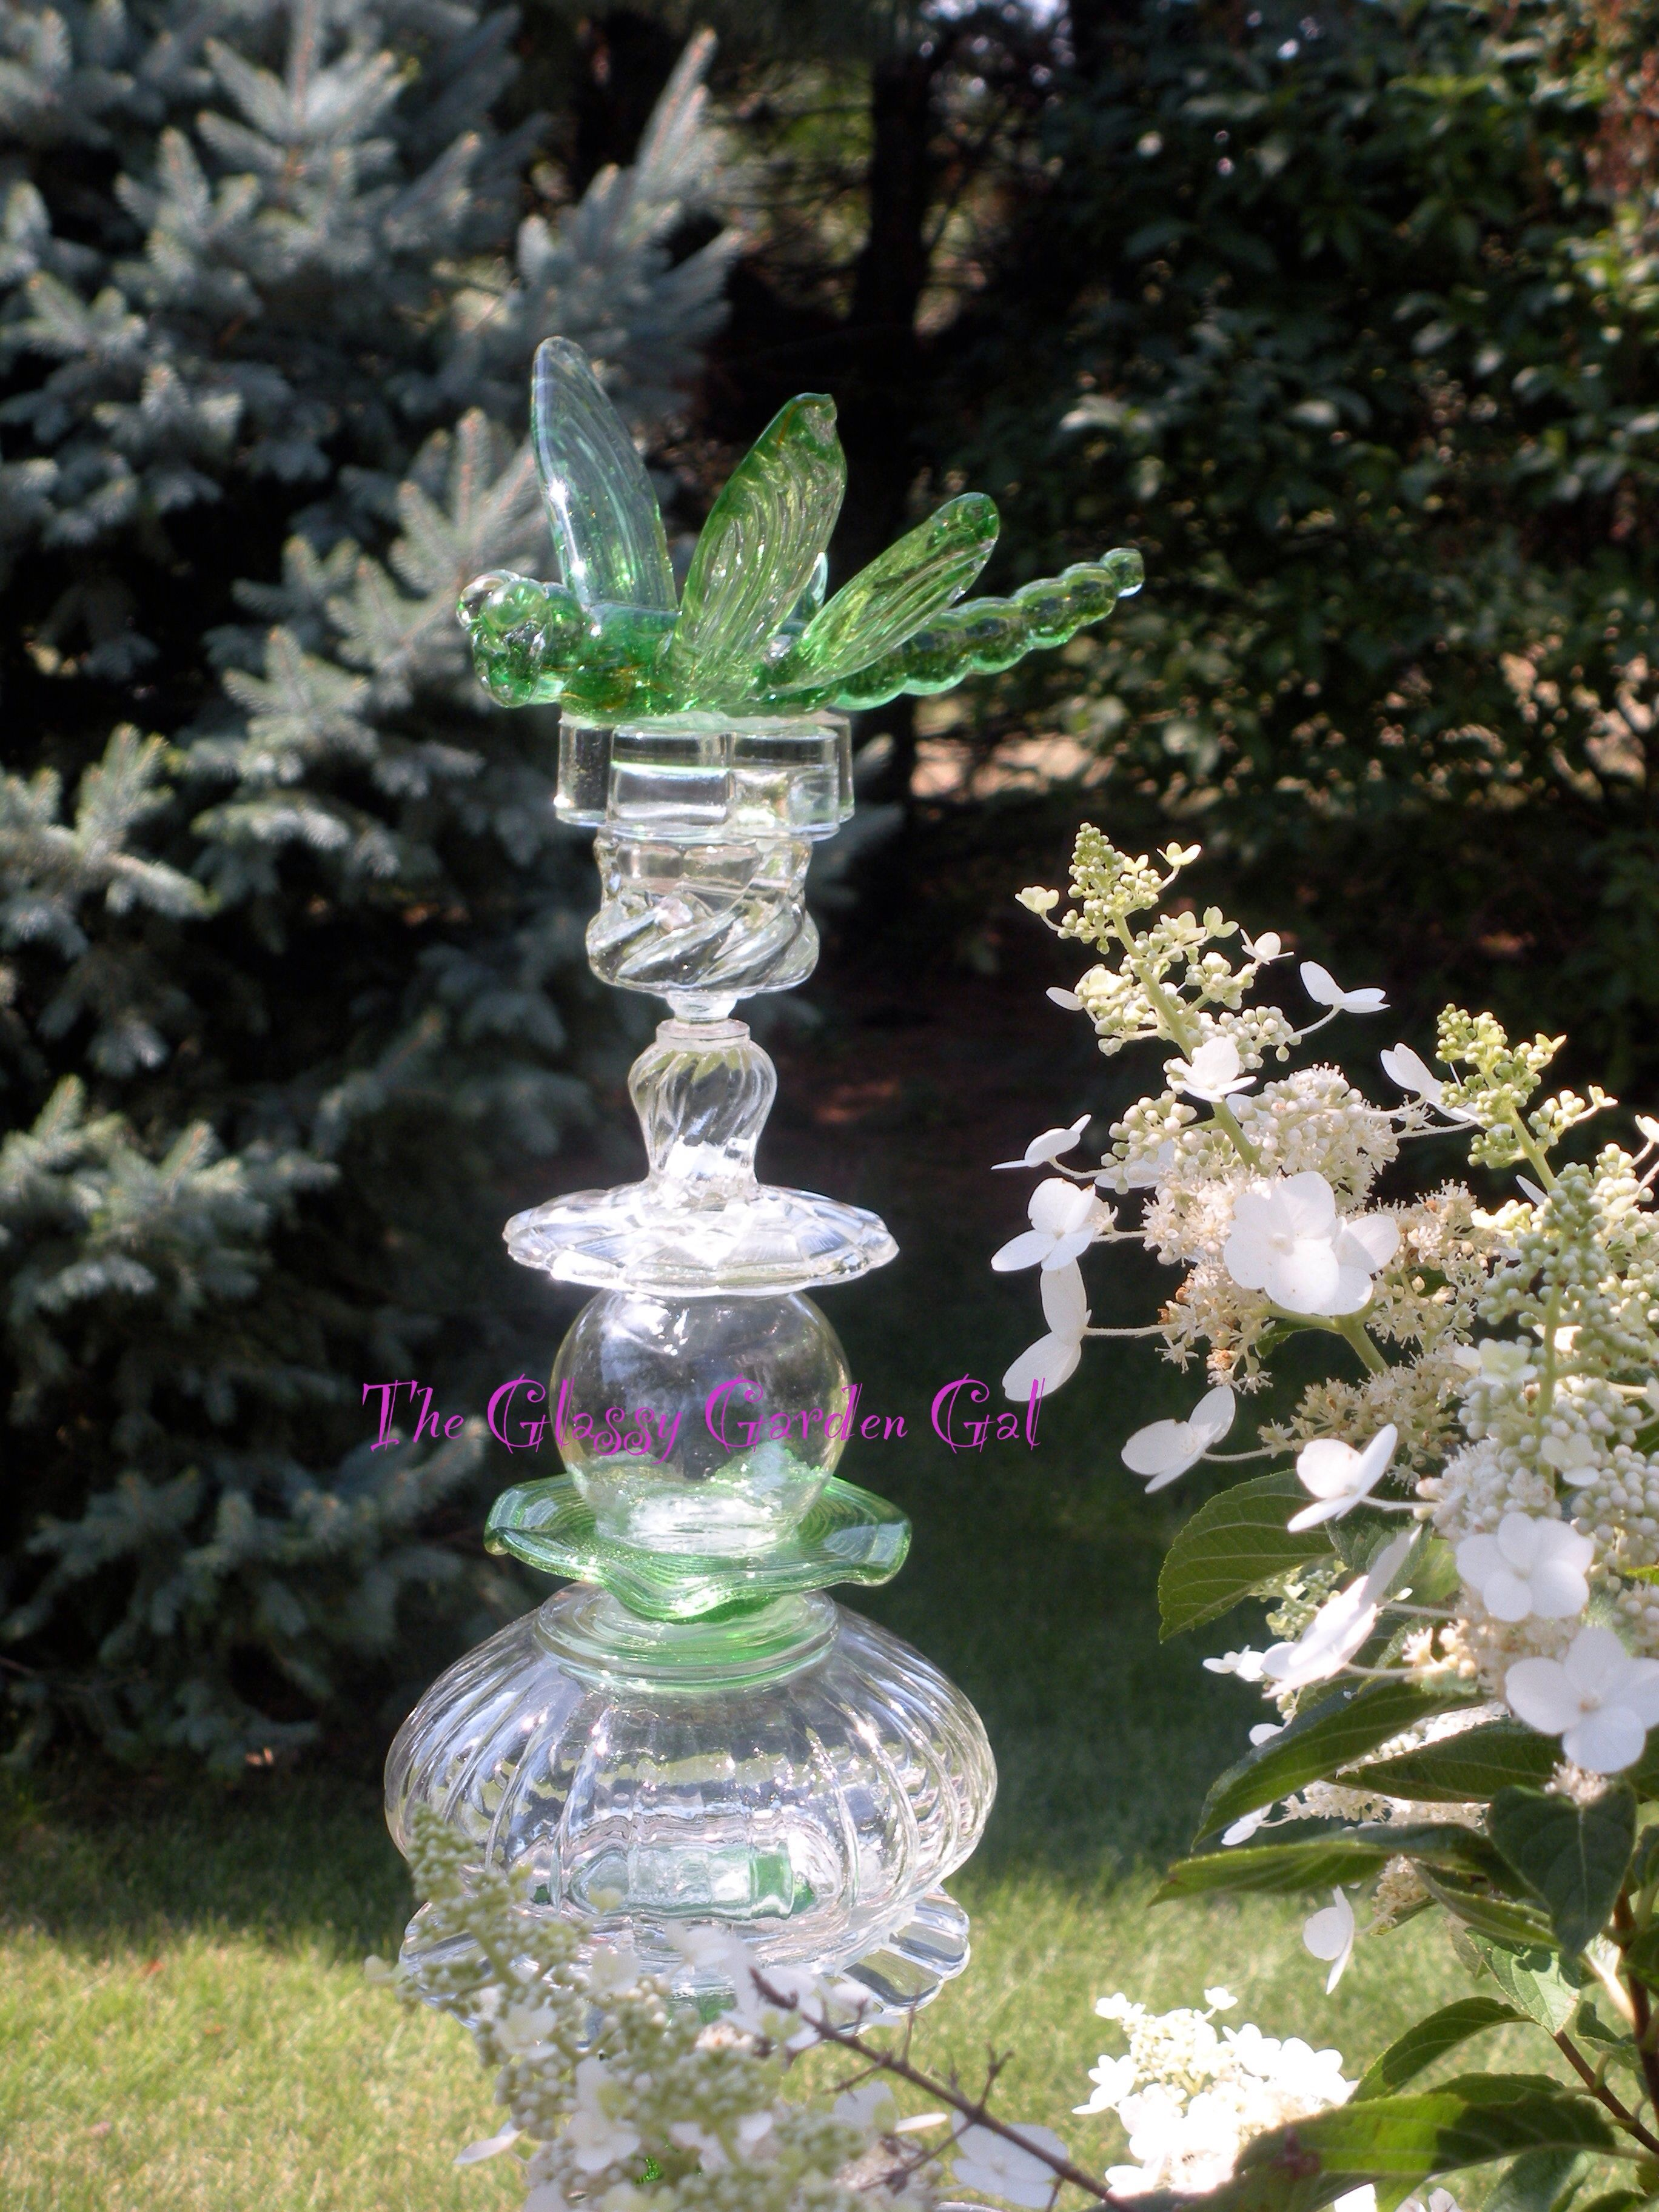 Glass garden totem glass garden art yard art repurposed for Recycled glass garden ornaments